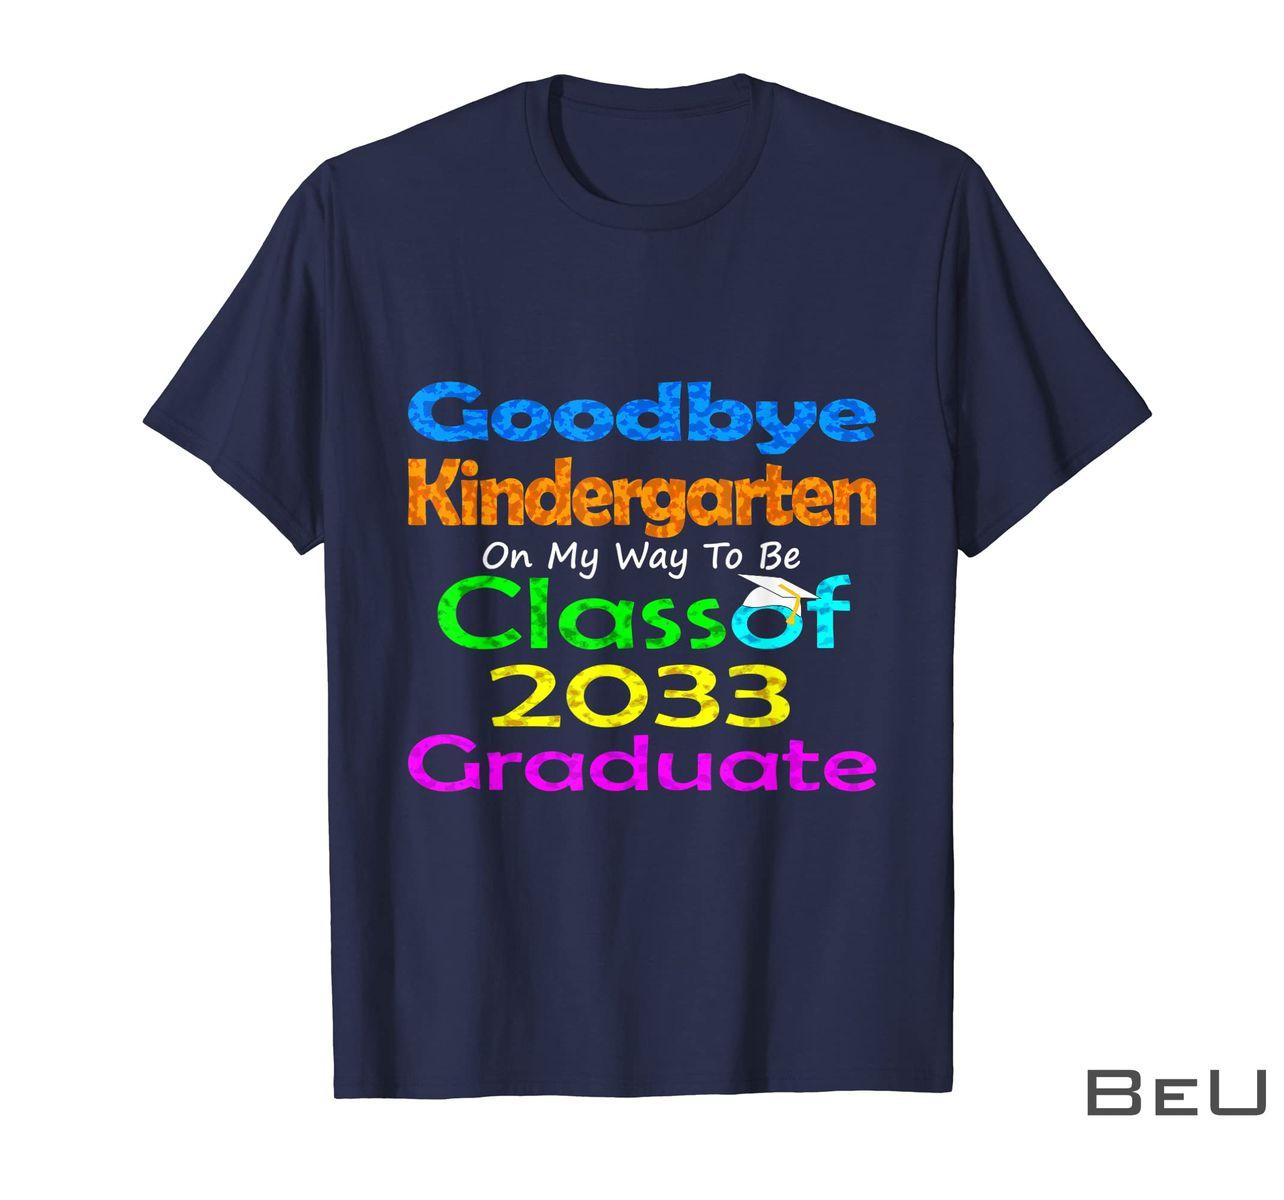 Goodbye Kindergarten On My Way To Be Class Of 2033 Graduate Shirt z